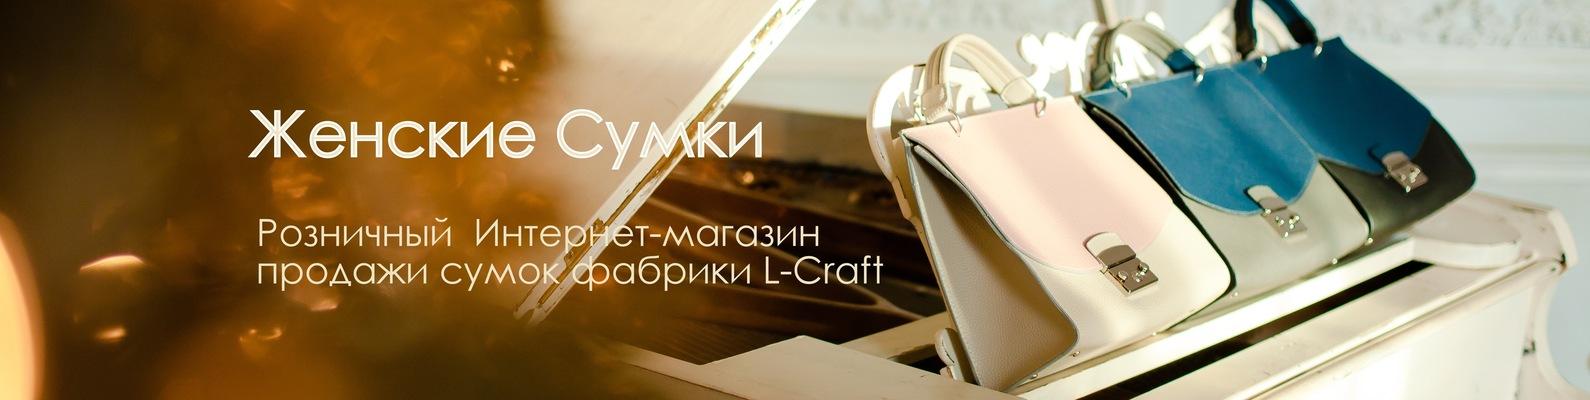 ec95990a6ca3 ЖЕНСКИЕ СУМКИ L-CRAFT | ВКонтакте